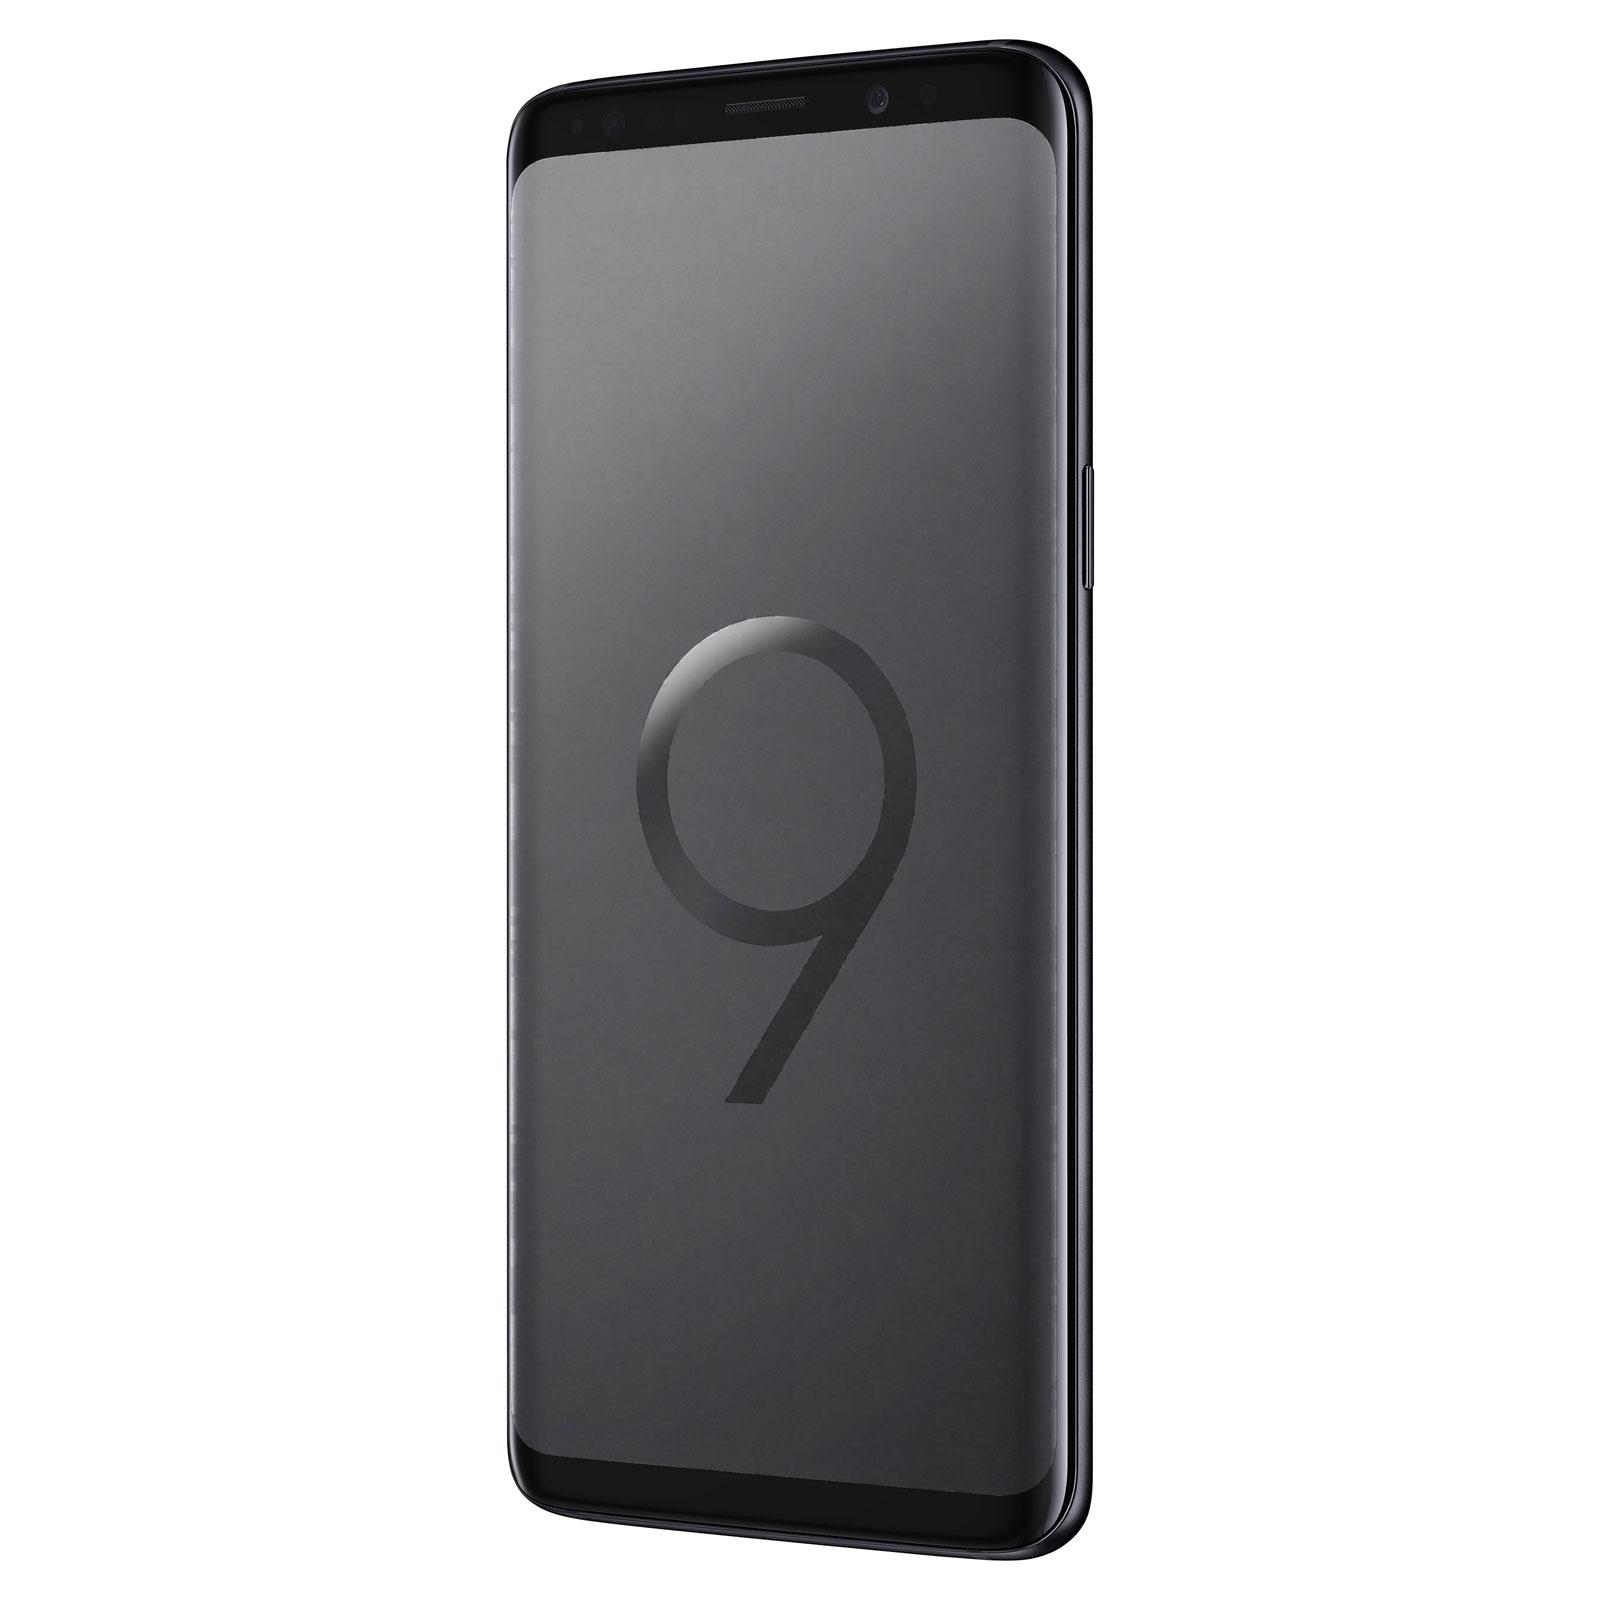 Samsung Galaxy S9 64GB Noir Carbone - Téléphonie Samsung - 3